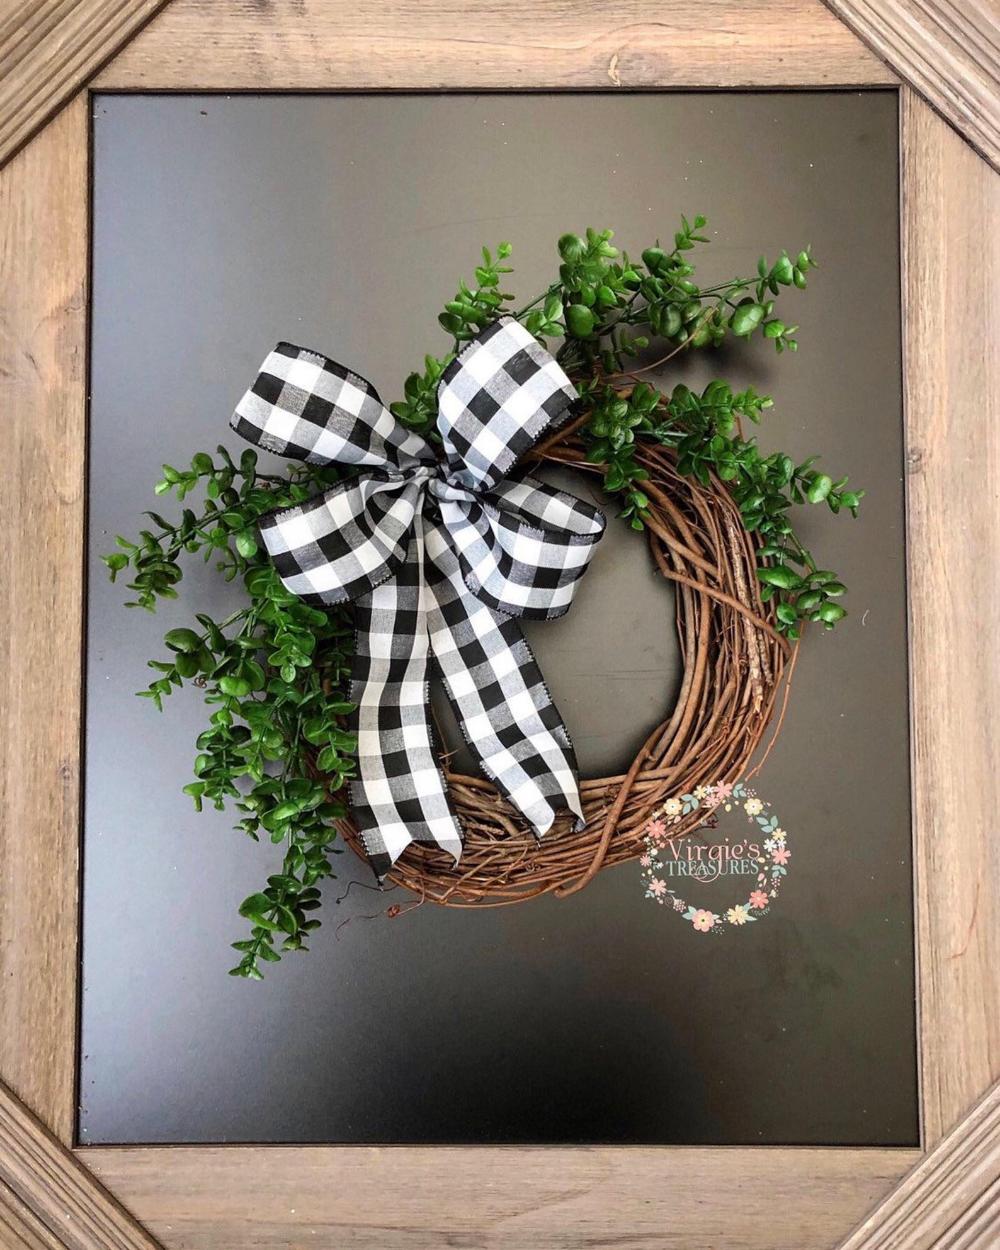 Photo of Farmhouse Wreath, Boxwood Stems & Buffalo Plaid Wreath, Rustic Chic Wreath, Everyday Wreath, Housewarming, Boxwood Wreath, 15 inch wreath